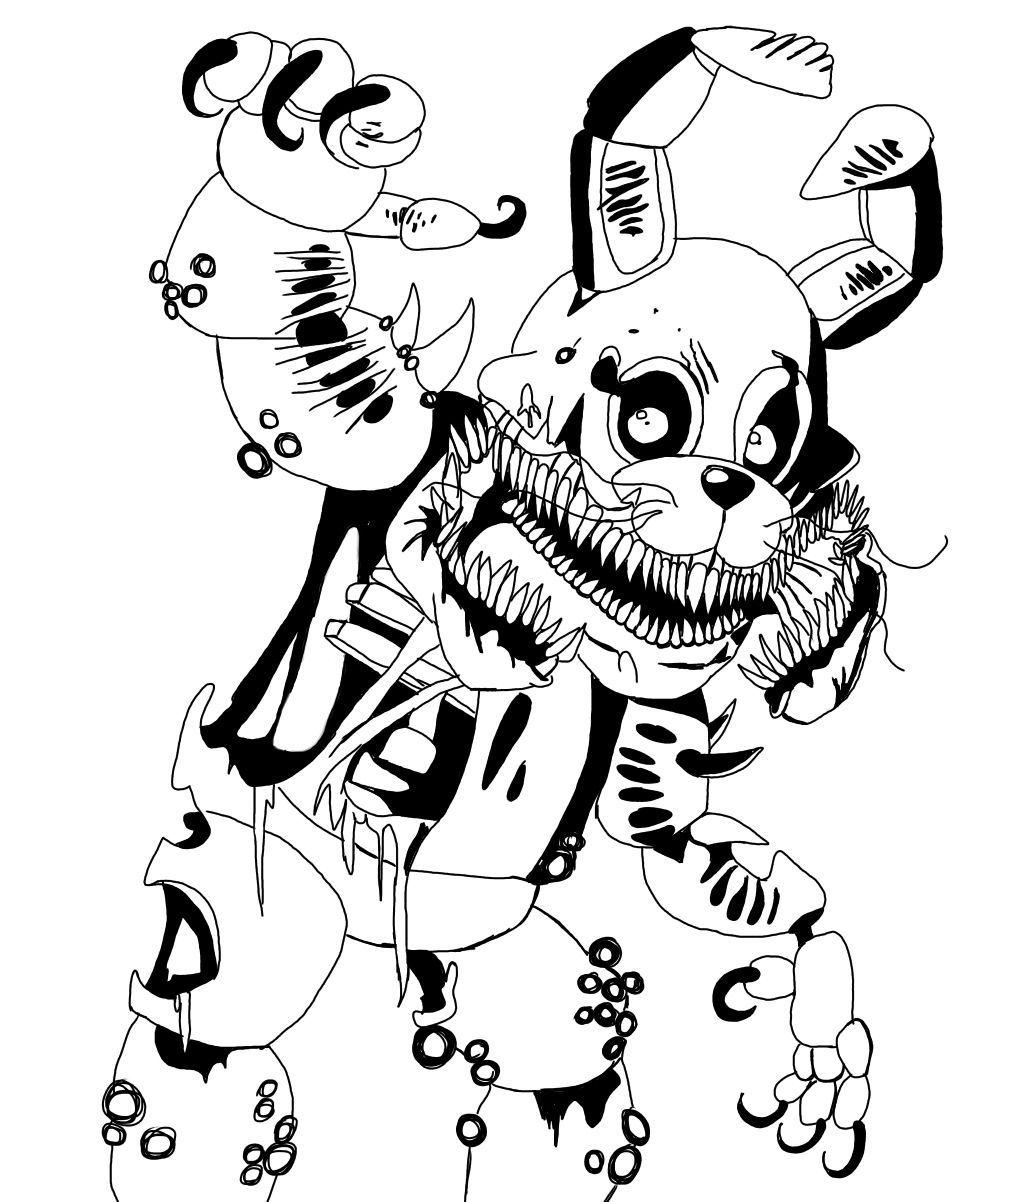 Fnaf Coloring Pages Springtrap Fnaf Coloring Pages Cat Coloring Book Fnaf Drawings